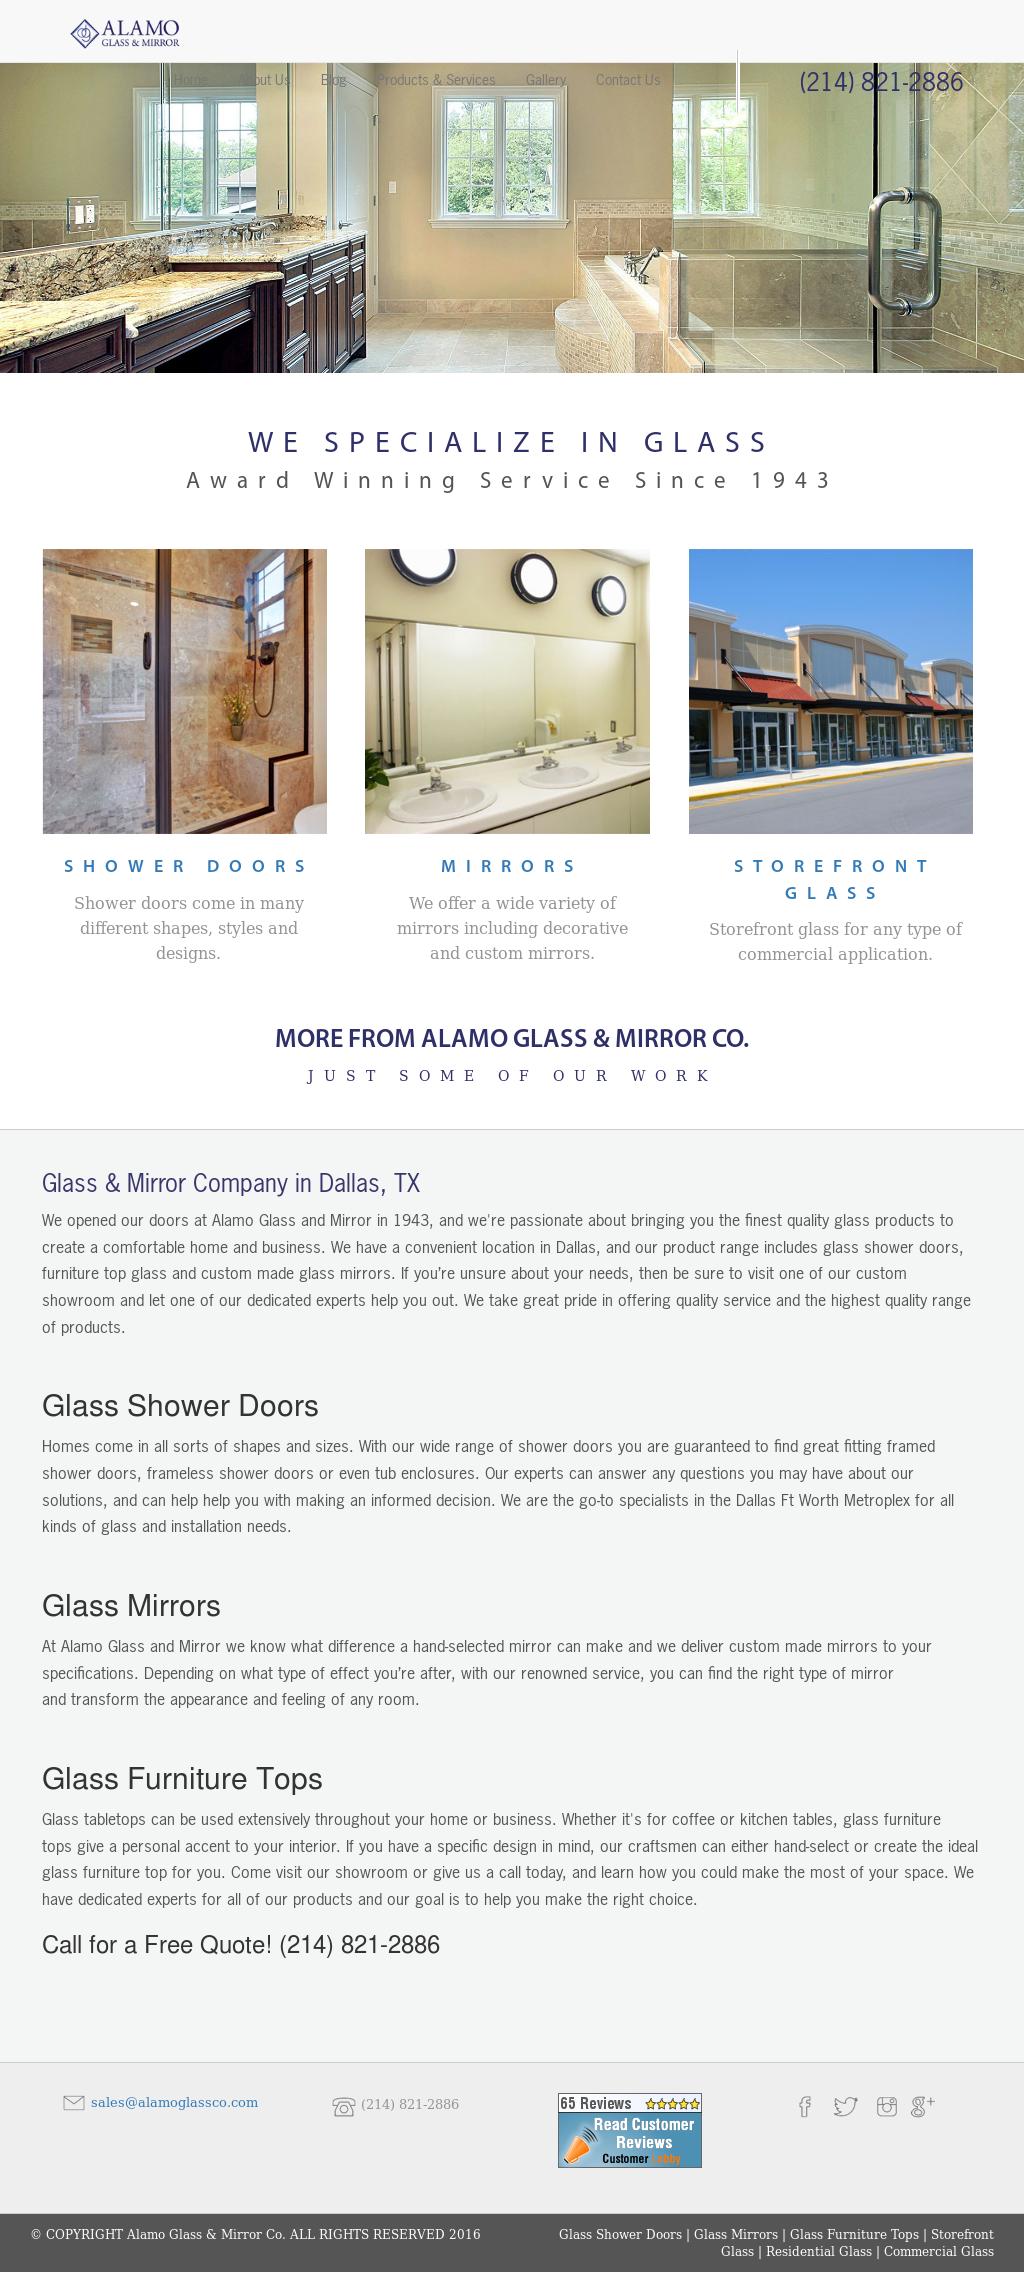 Alamo Gl Mirror Website History